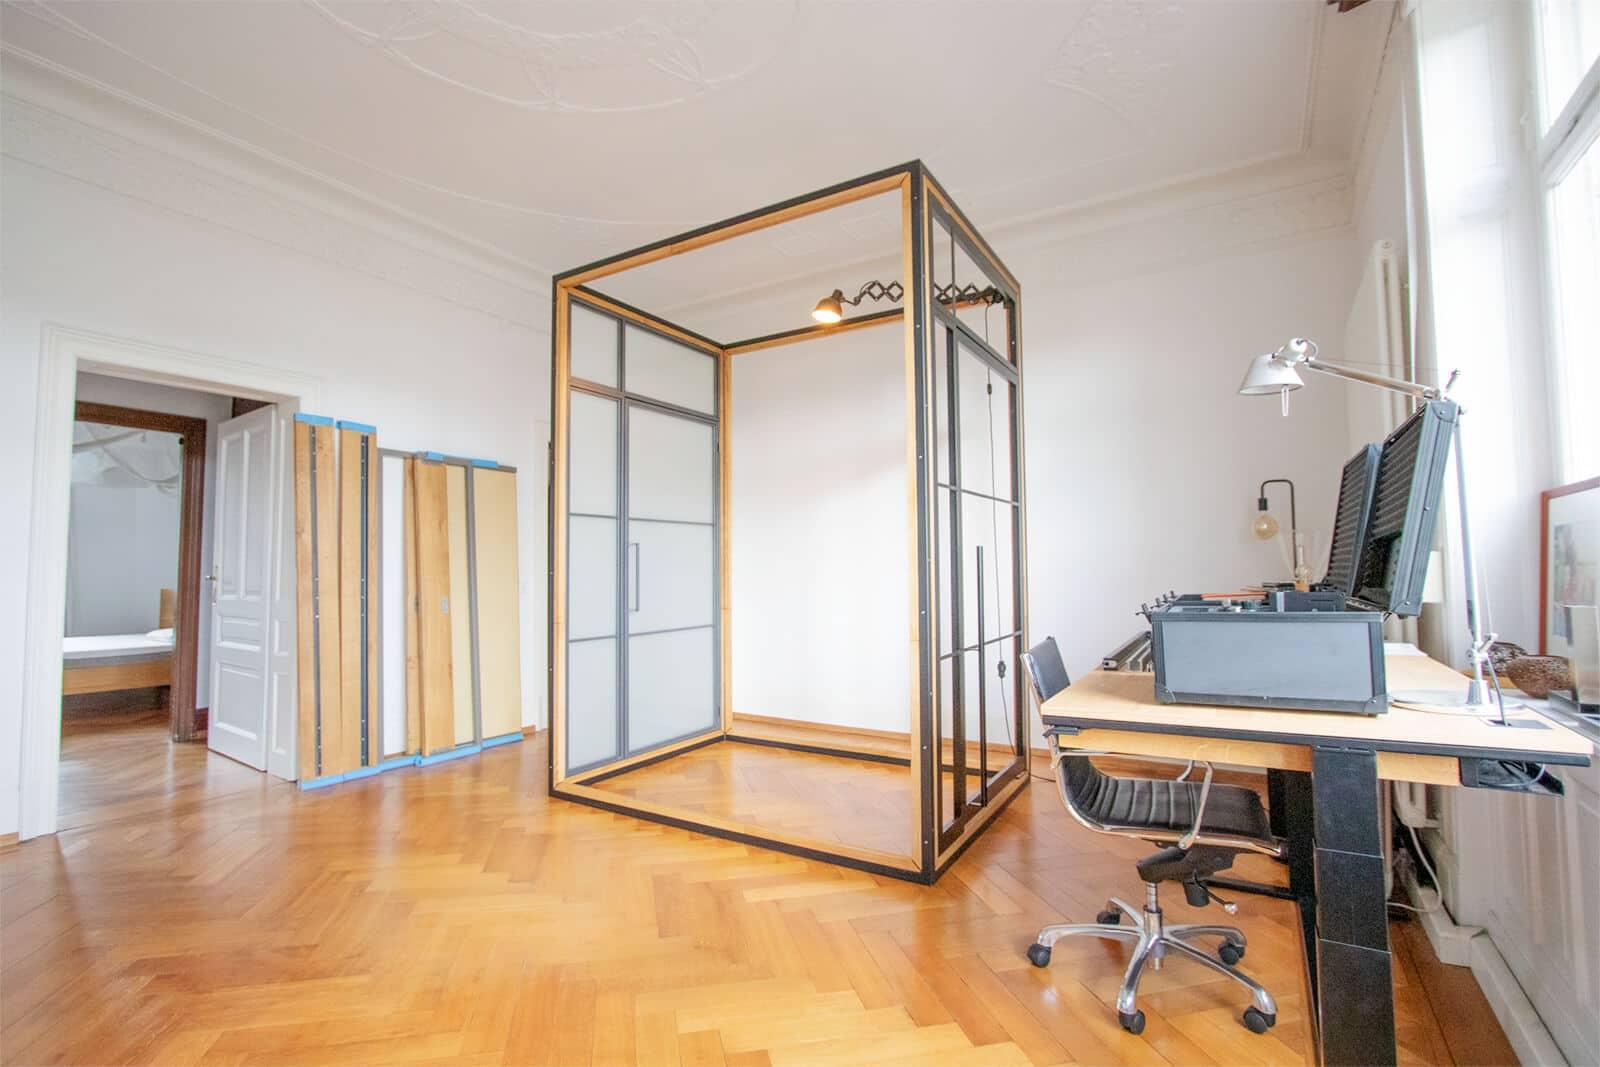 Loftstahl, Loft-stahl.de, N51E12, Showroom Offenbach, Frankfurt, Designbett, Stahl Loft Tür, Ausstellung, Officev